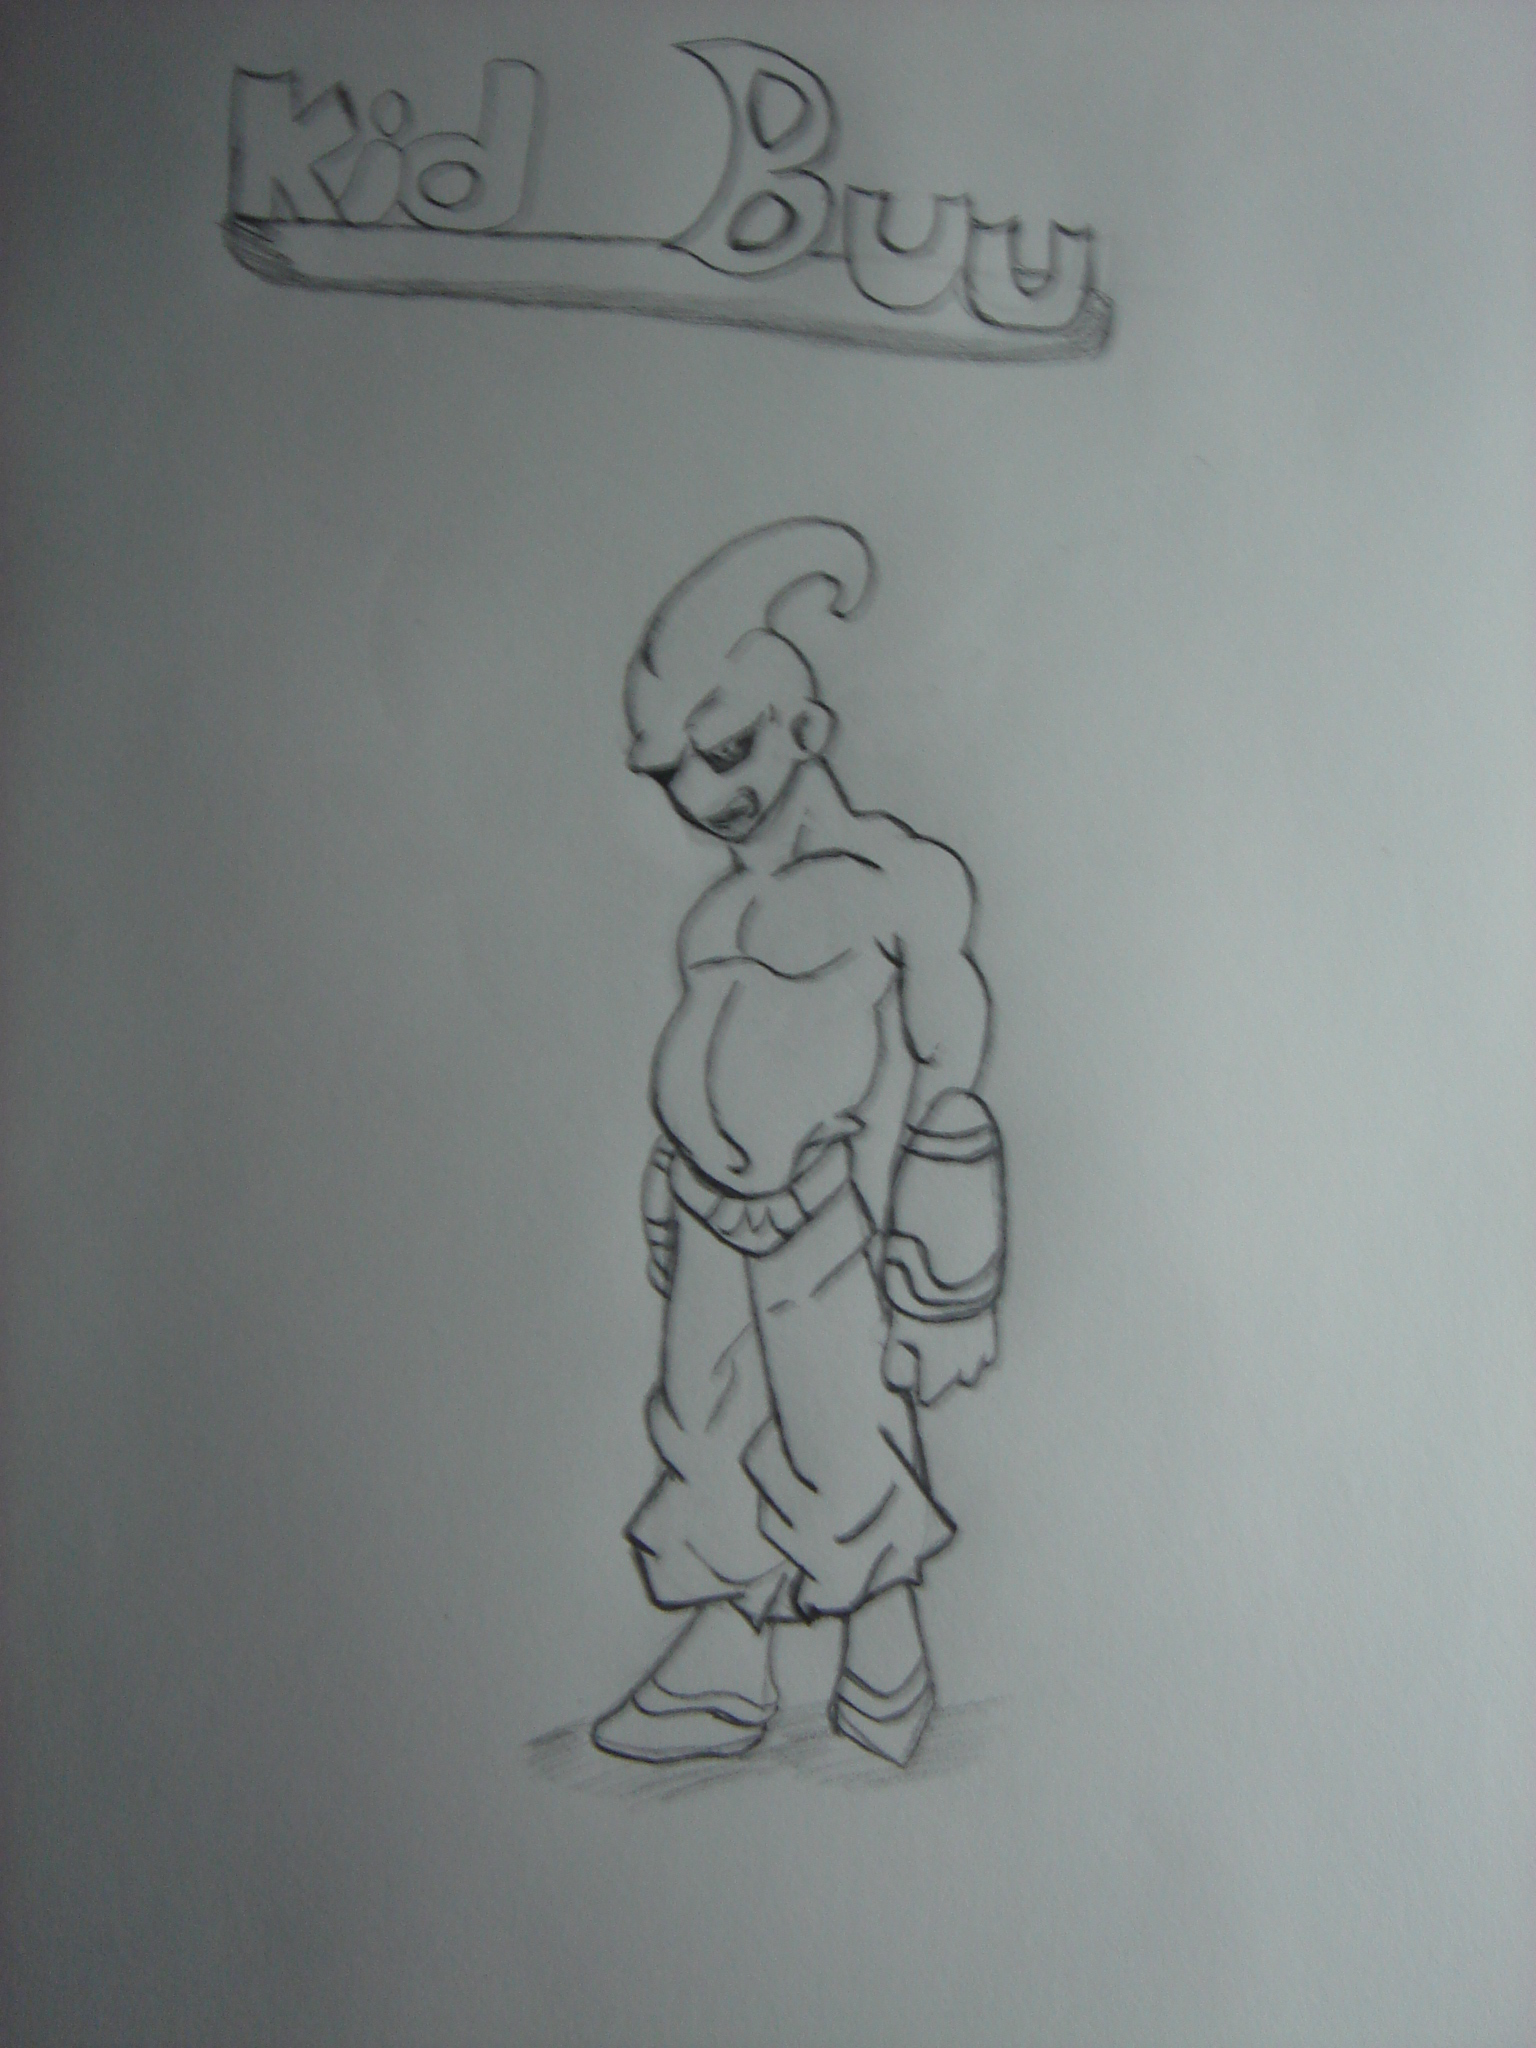 Kid Buu Drawing : drawing, Drawing, Feltonand, Dragoart.com